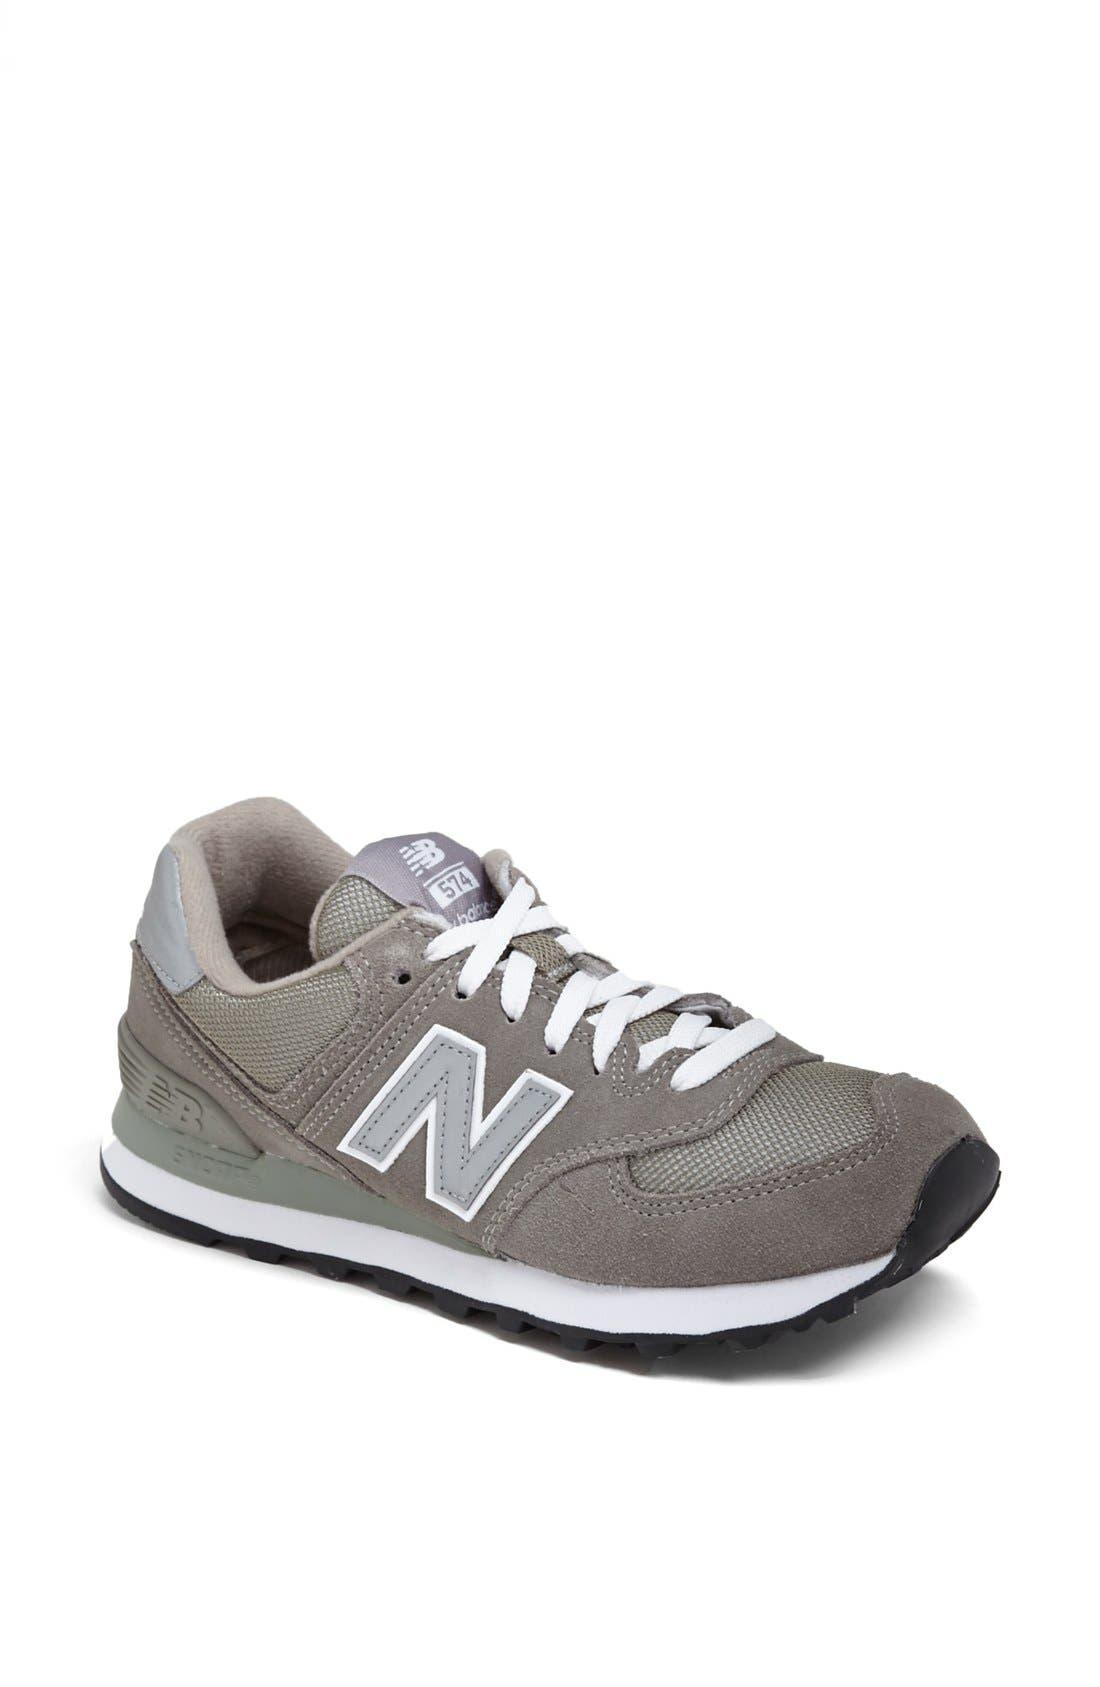 Alternate Image 1 Selected - New Balance '574' Sneaker (Women)